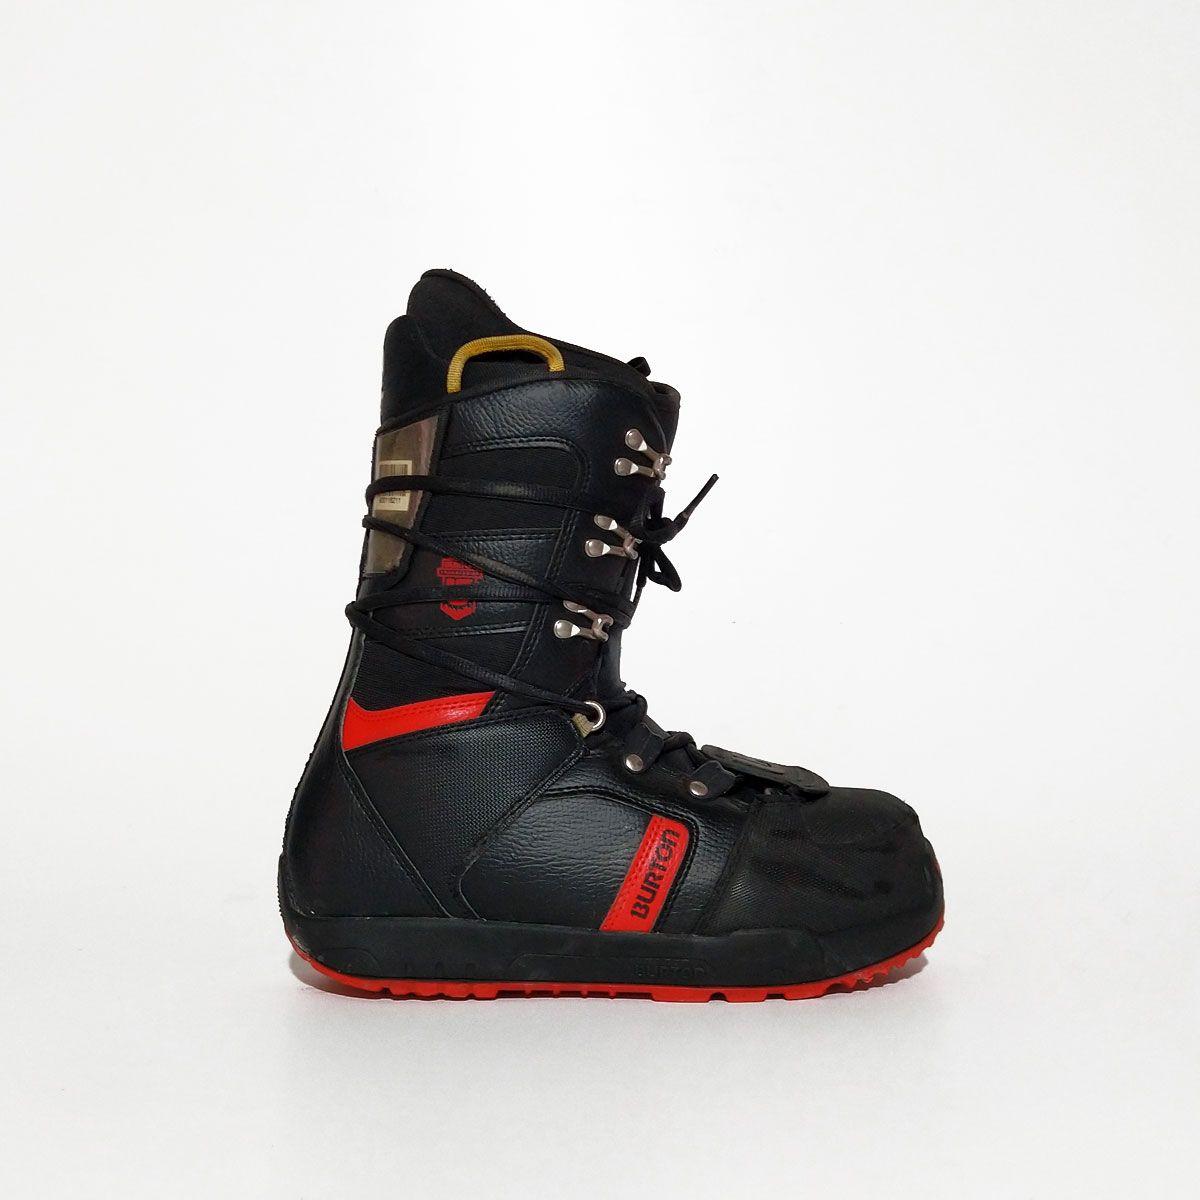 boots-snowboard-burton-progression-1